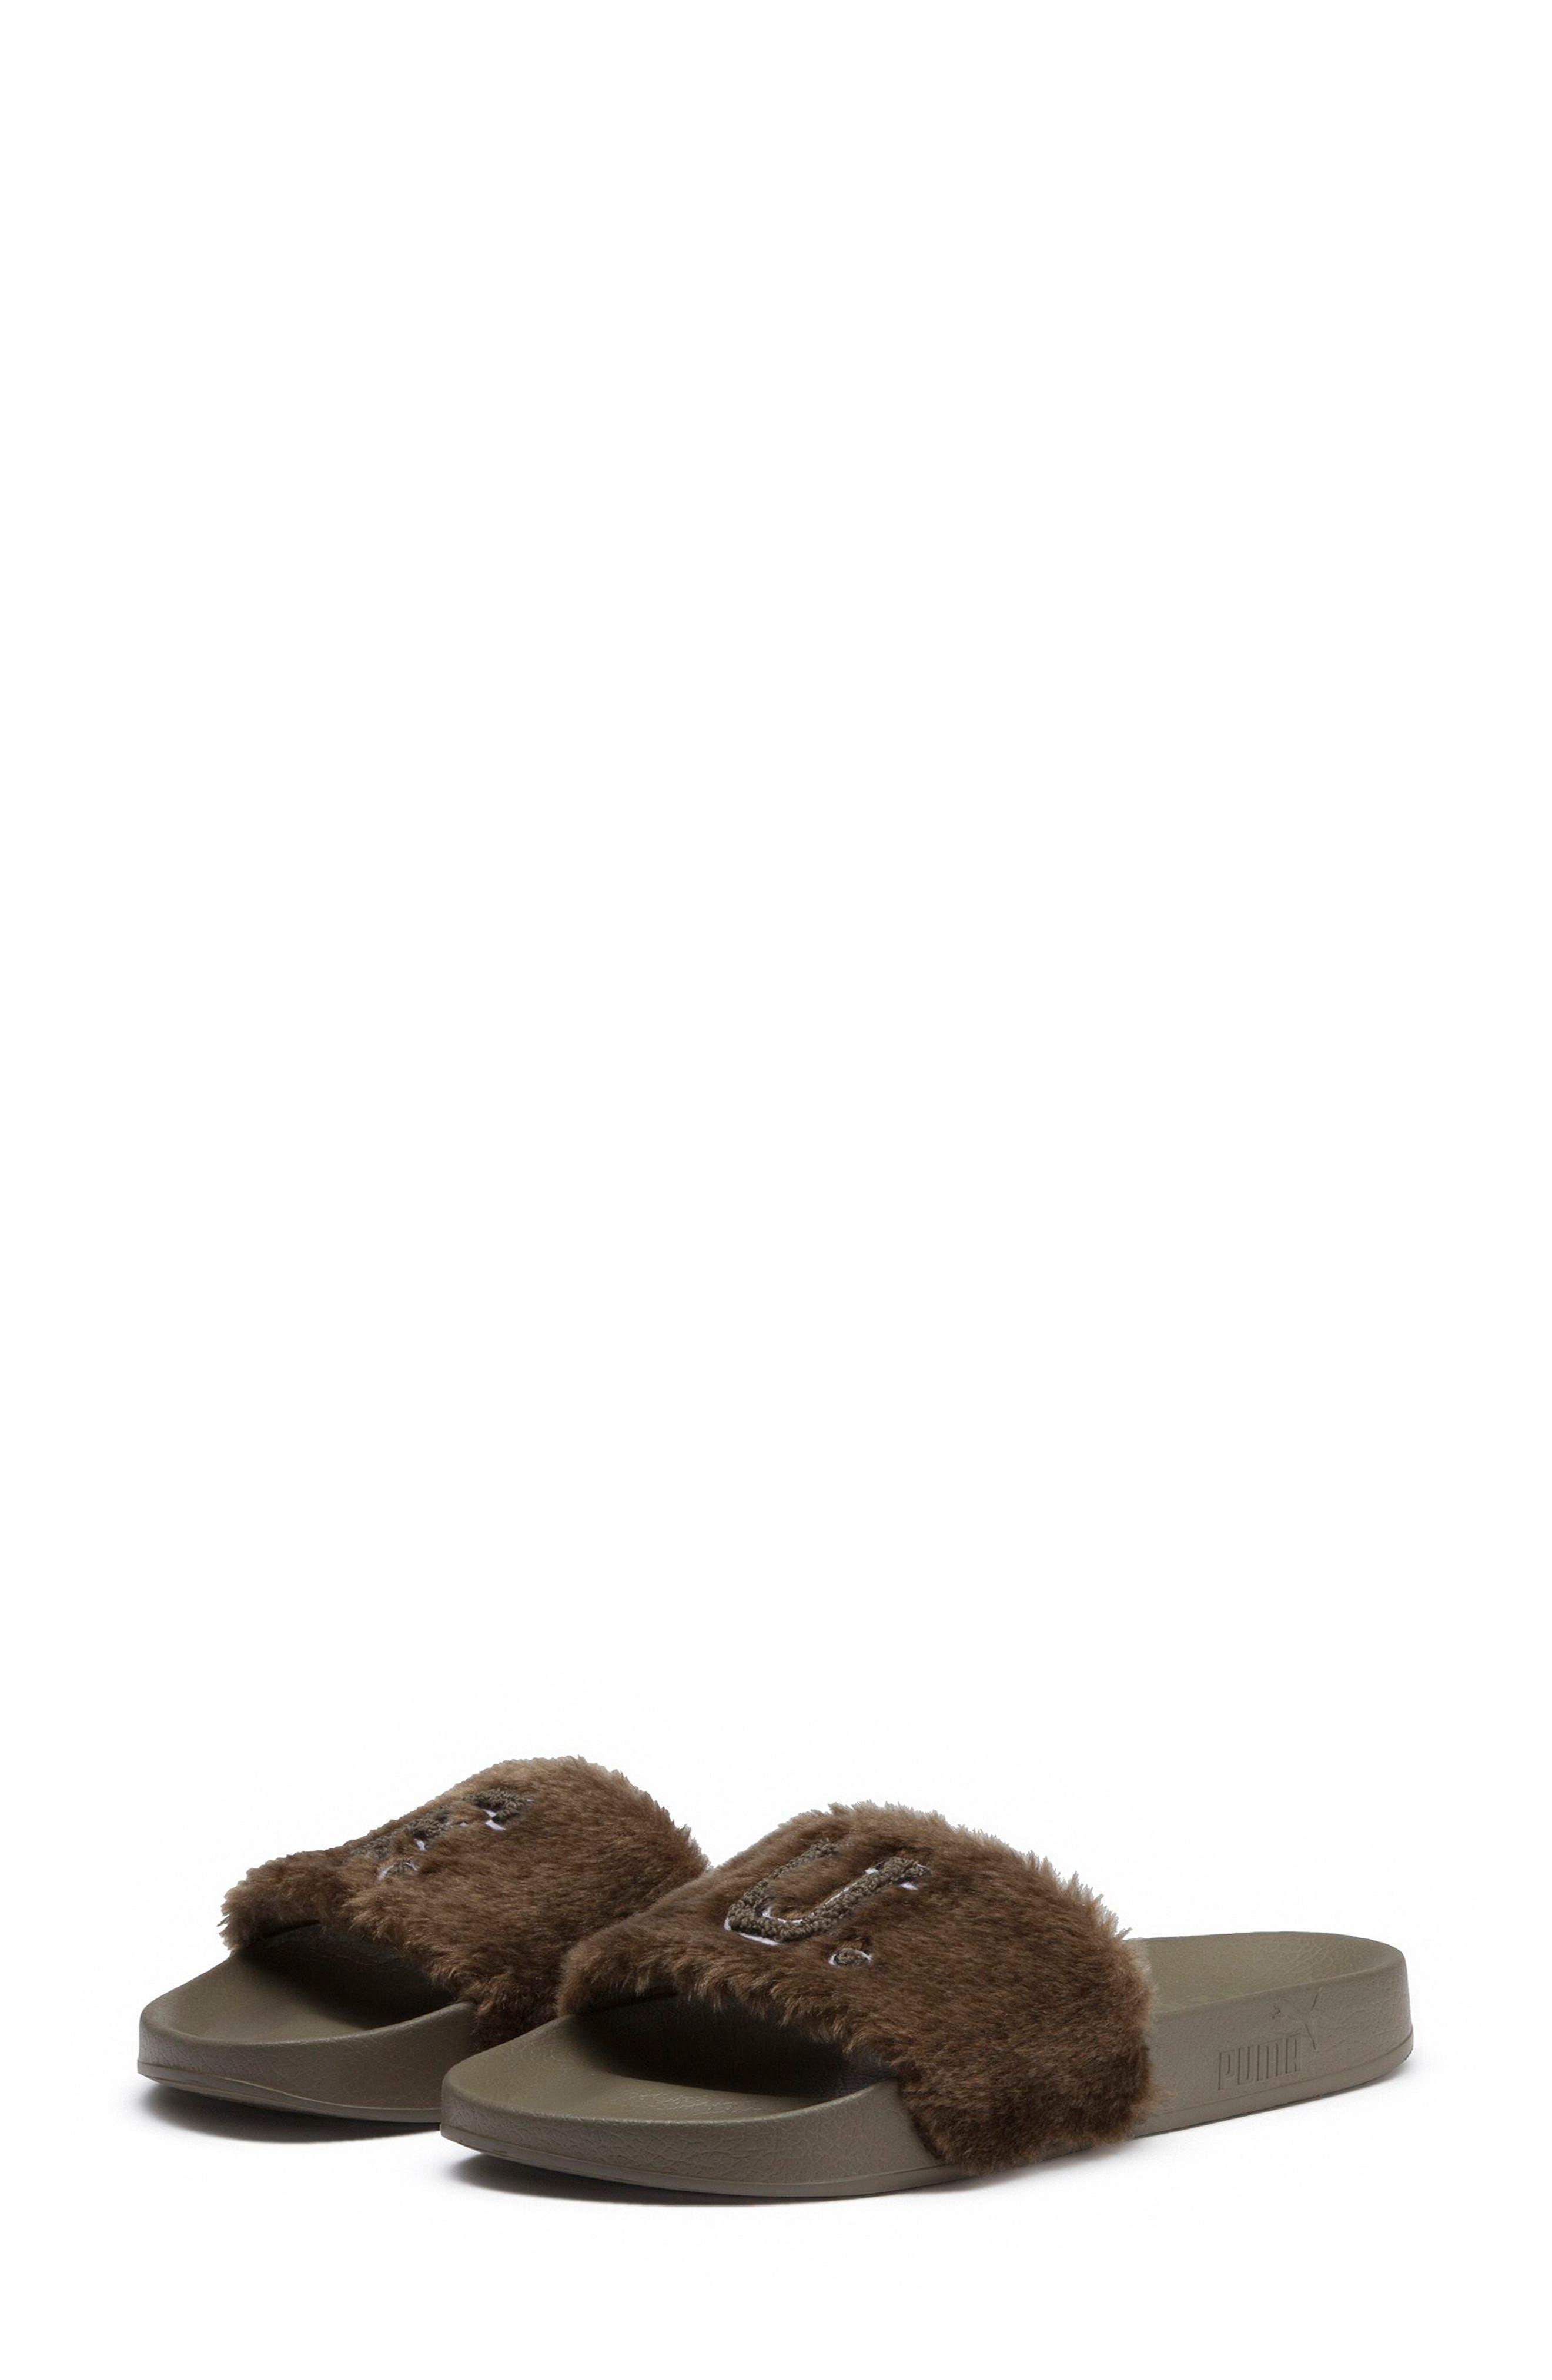 FENTY PUMA by Rihanna Lead Cat Slide Sandals,                             Alternate thumbnail 2, color,                             Burnt Olive - Puma Black